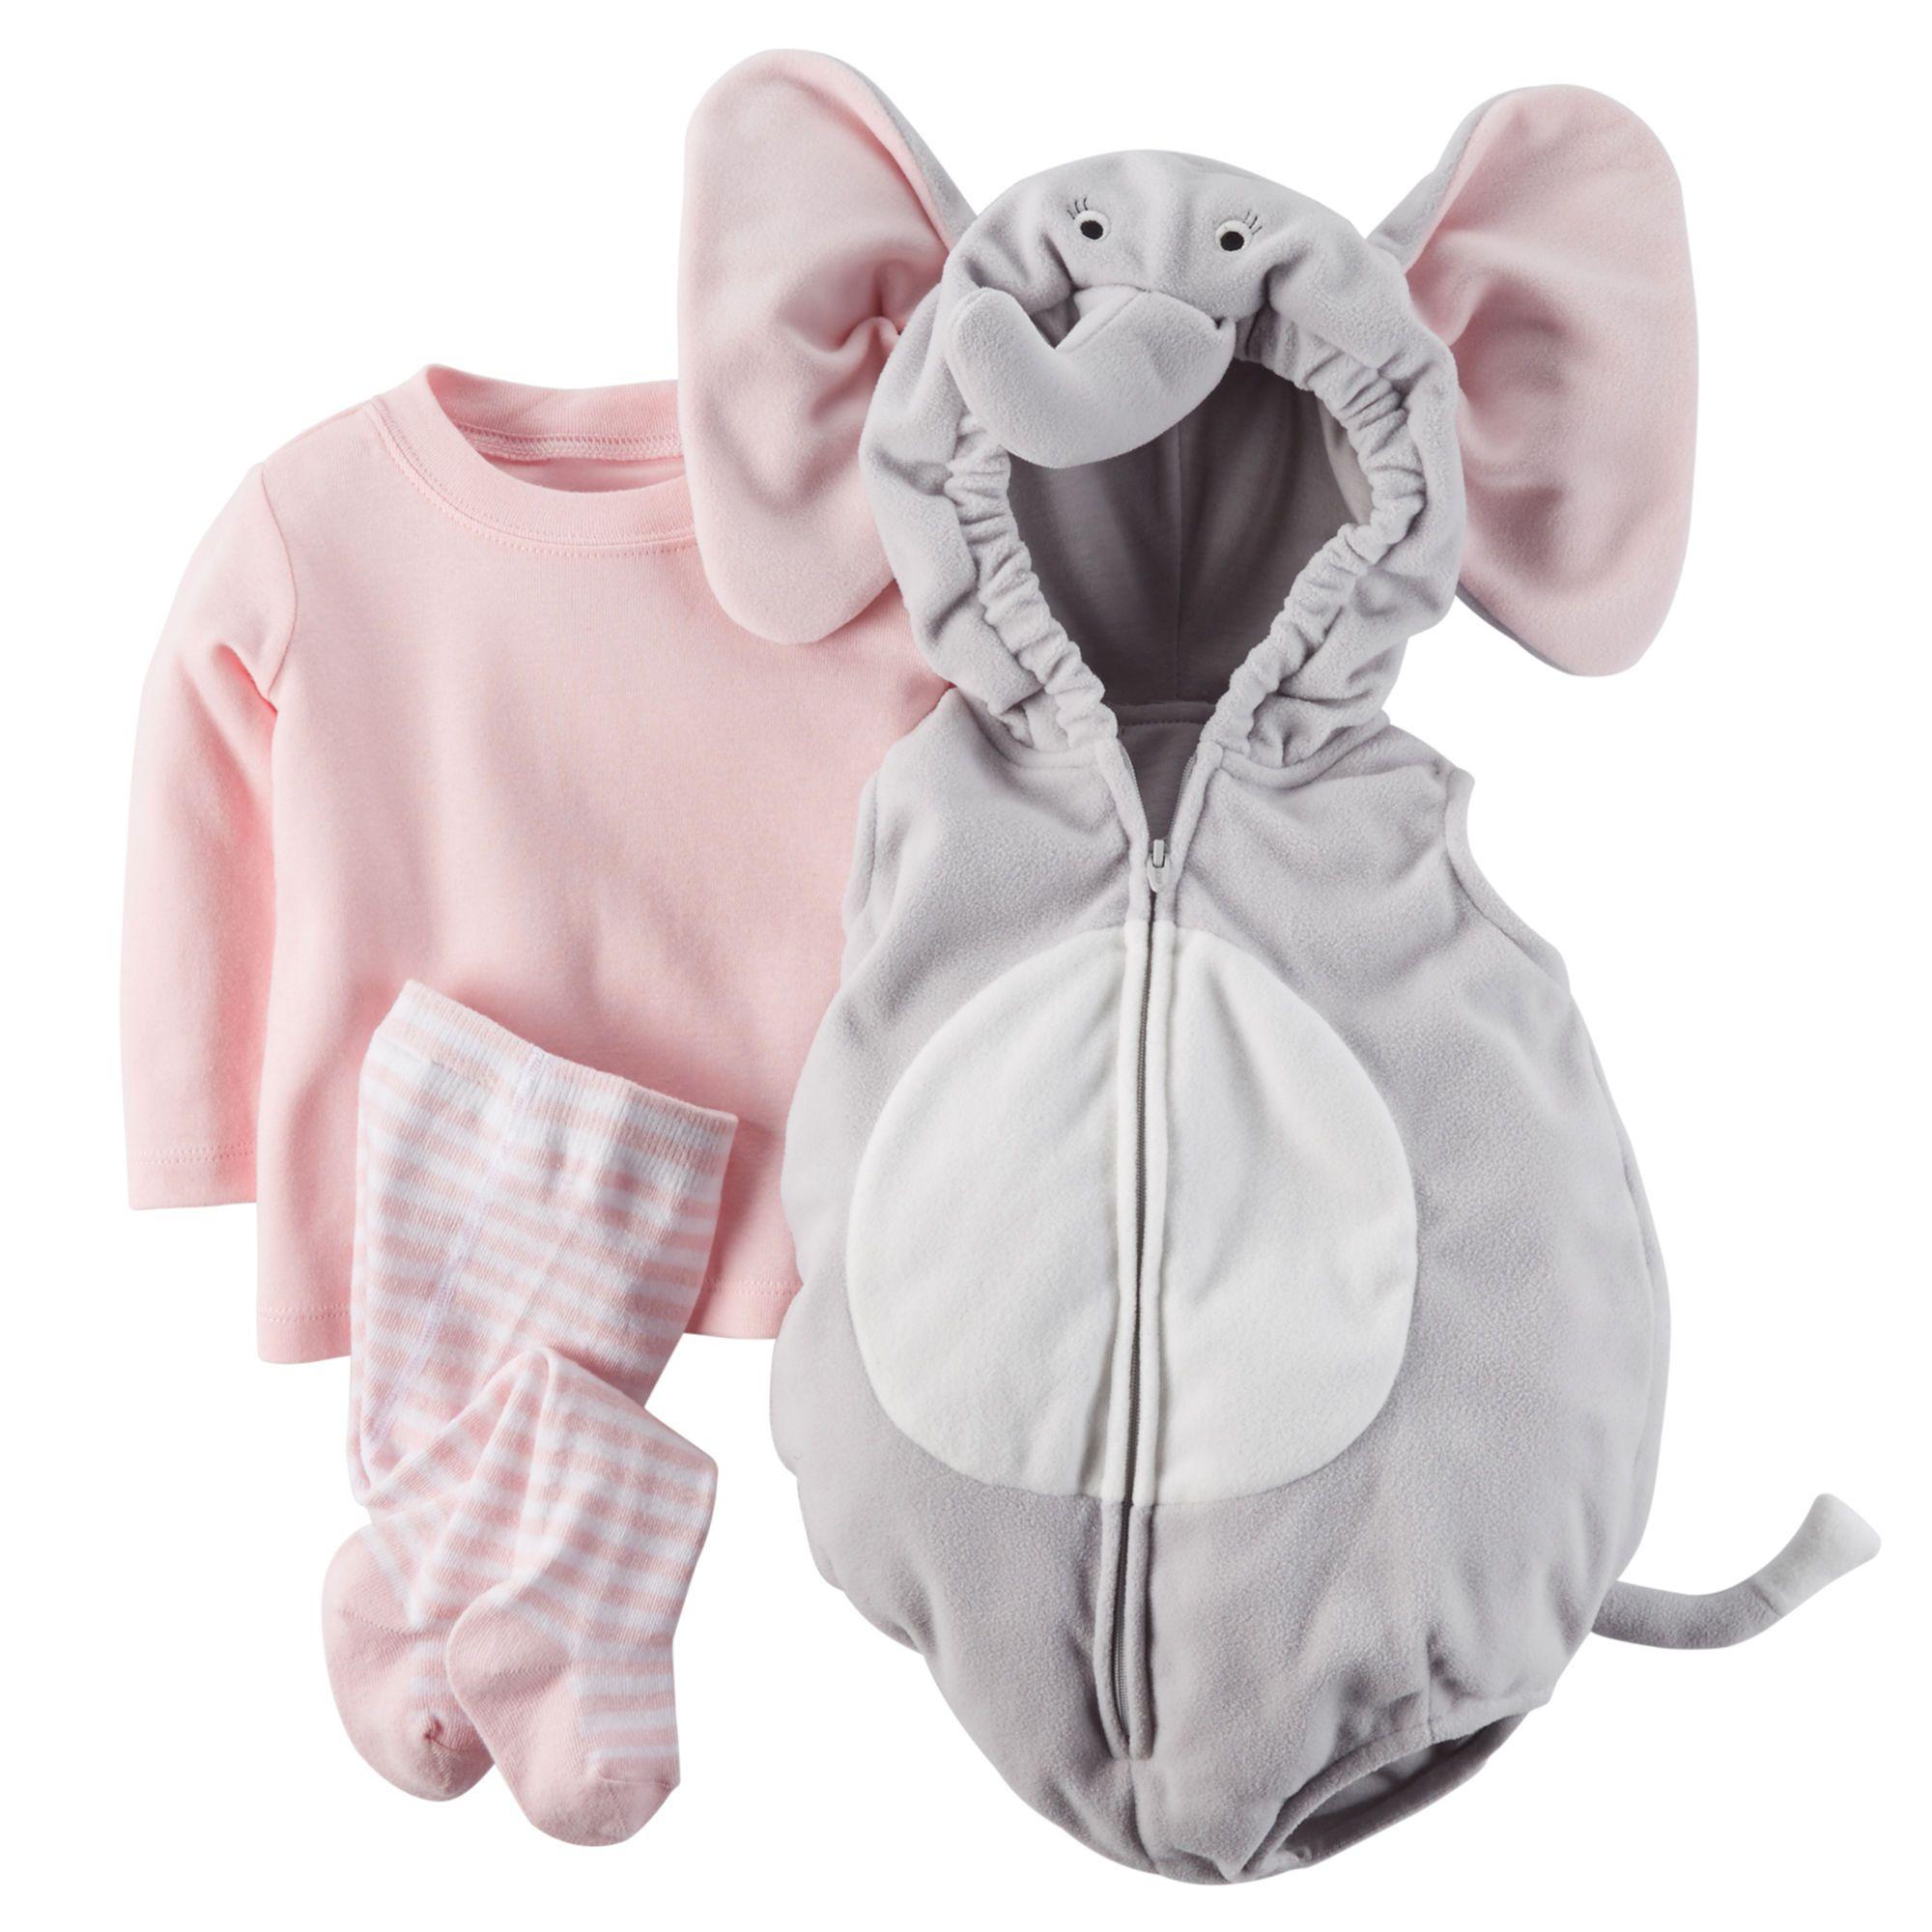 little baby elephant halloween costume, grey | greybay | pinterest